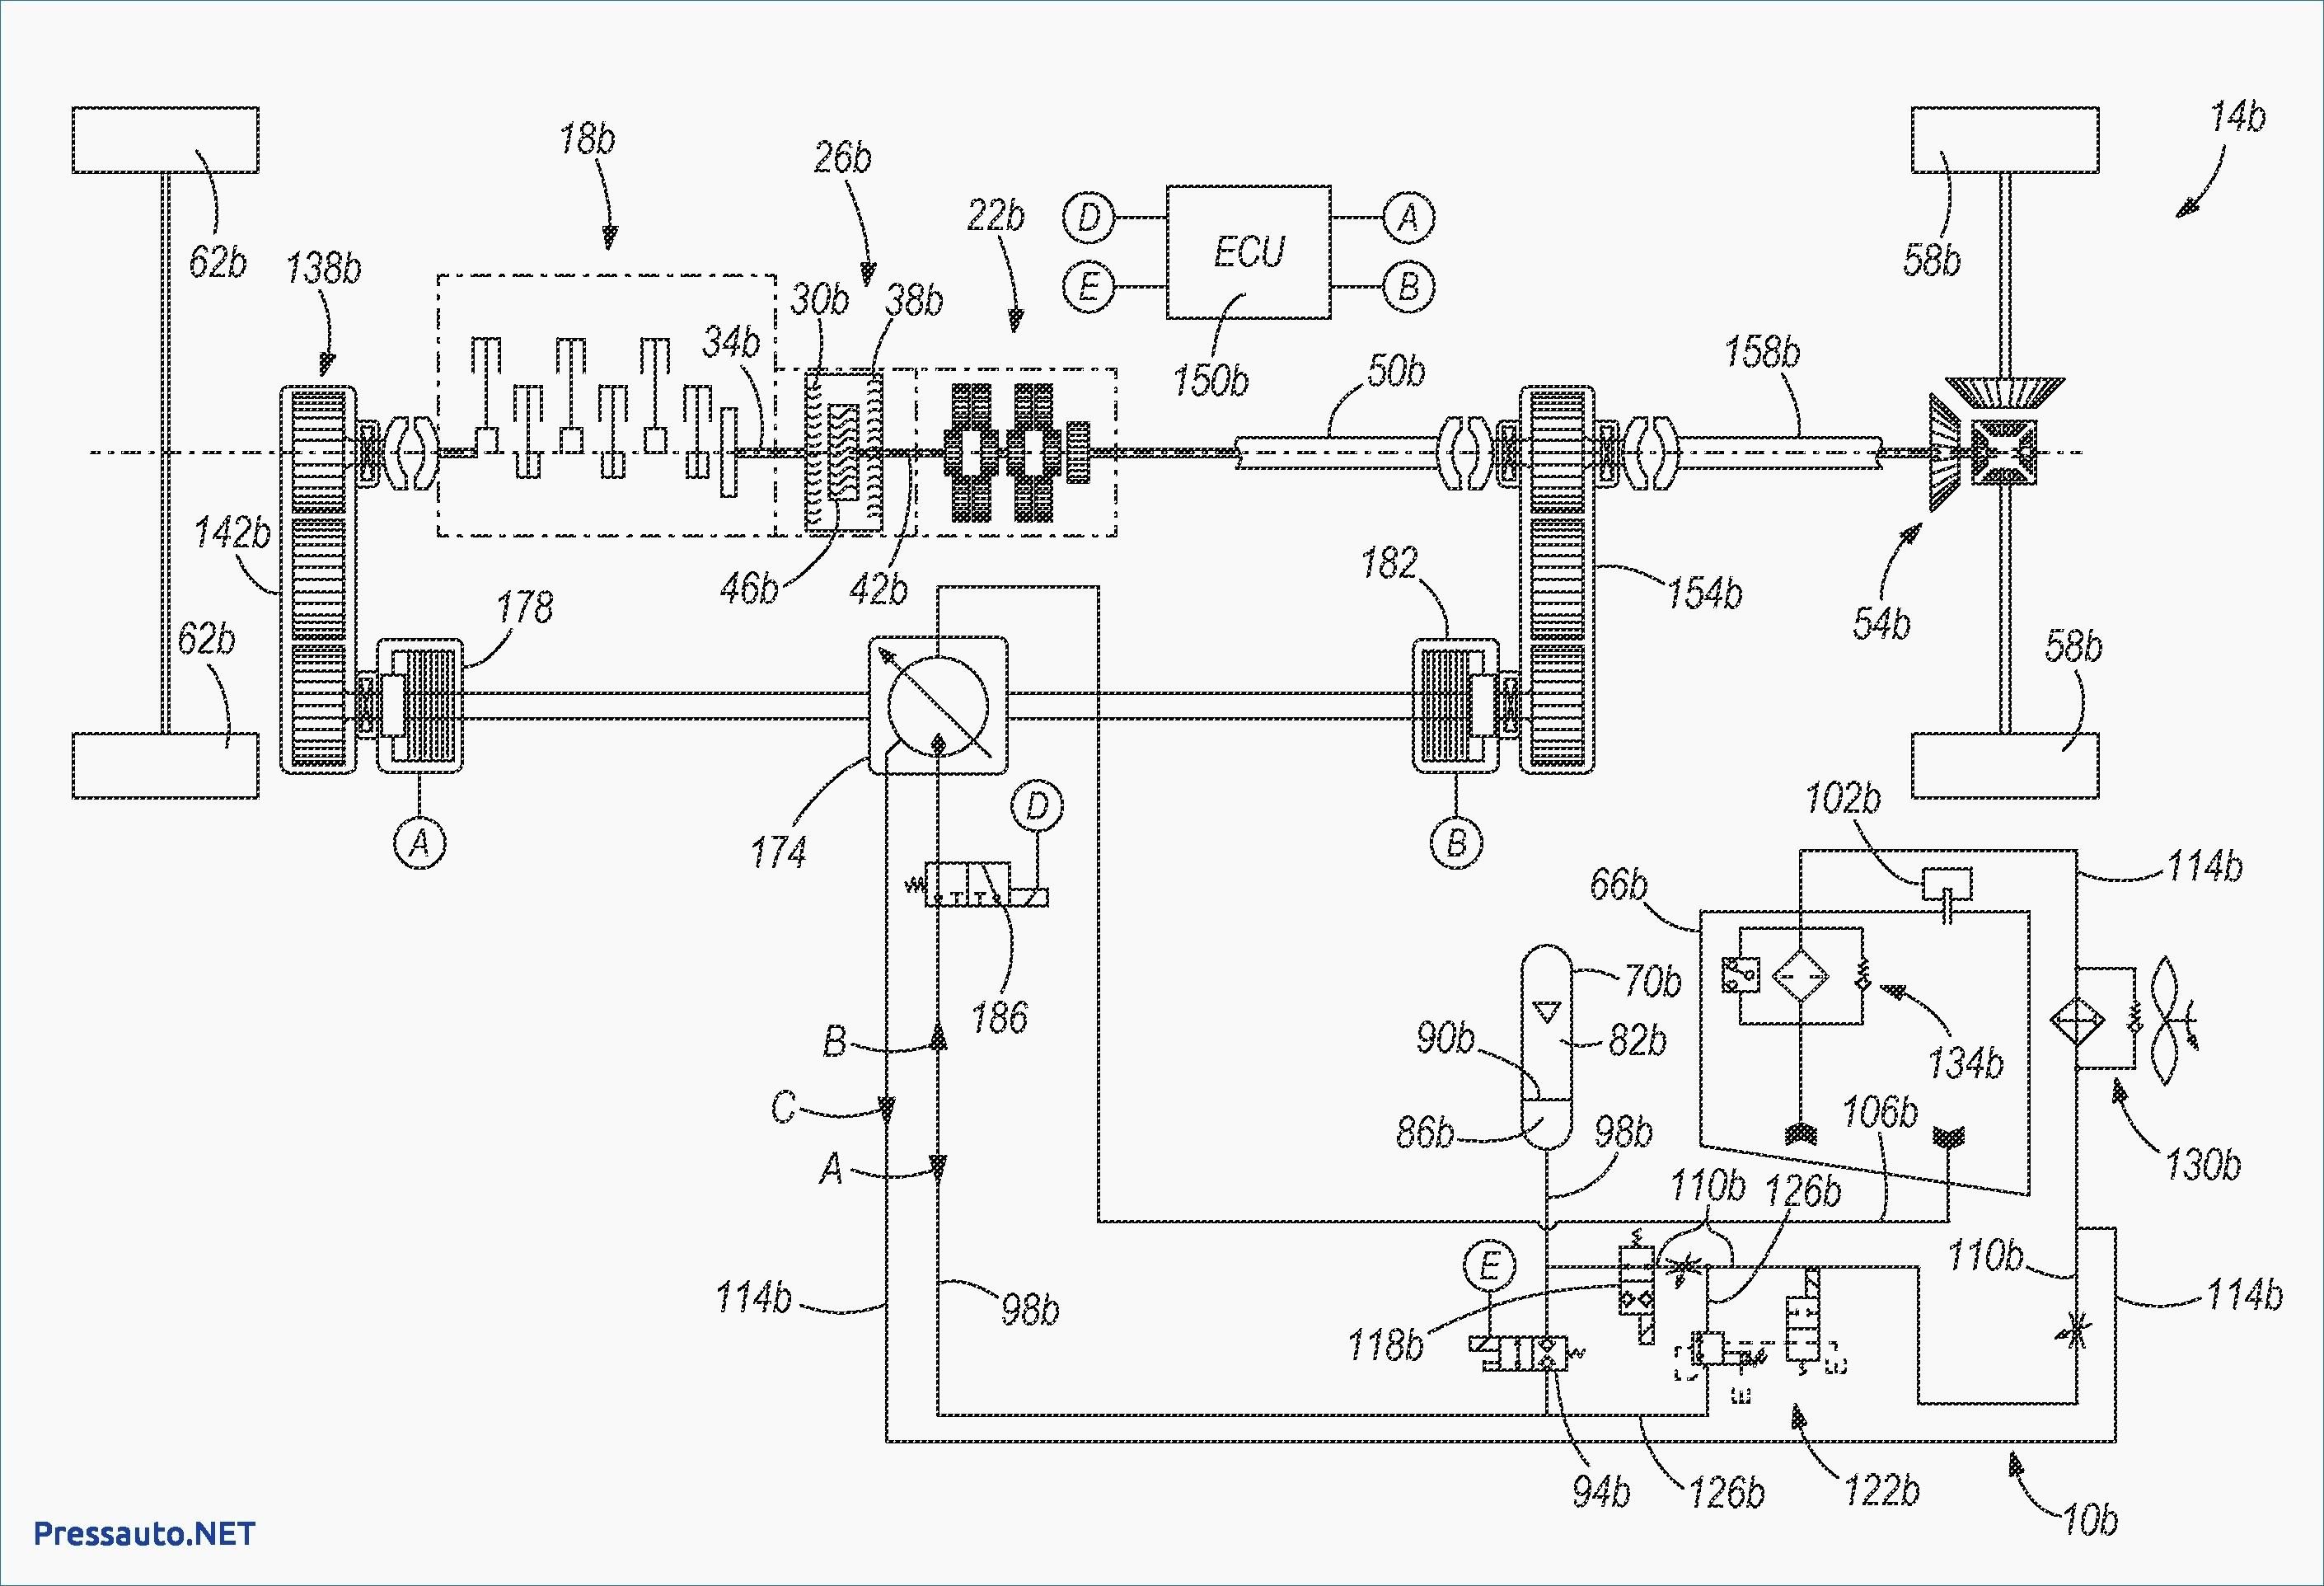 small resolution of wiring diagram mahindra 7010 wiring diagram centre wiring diagram mahindra 475 wiring diagrammahindra 2216 wiring diagram